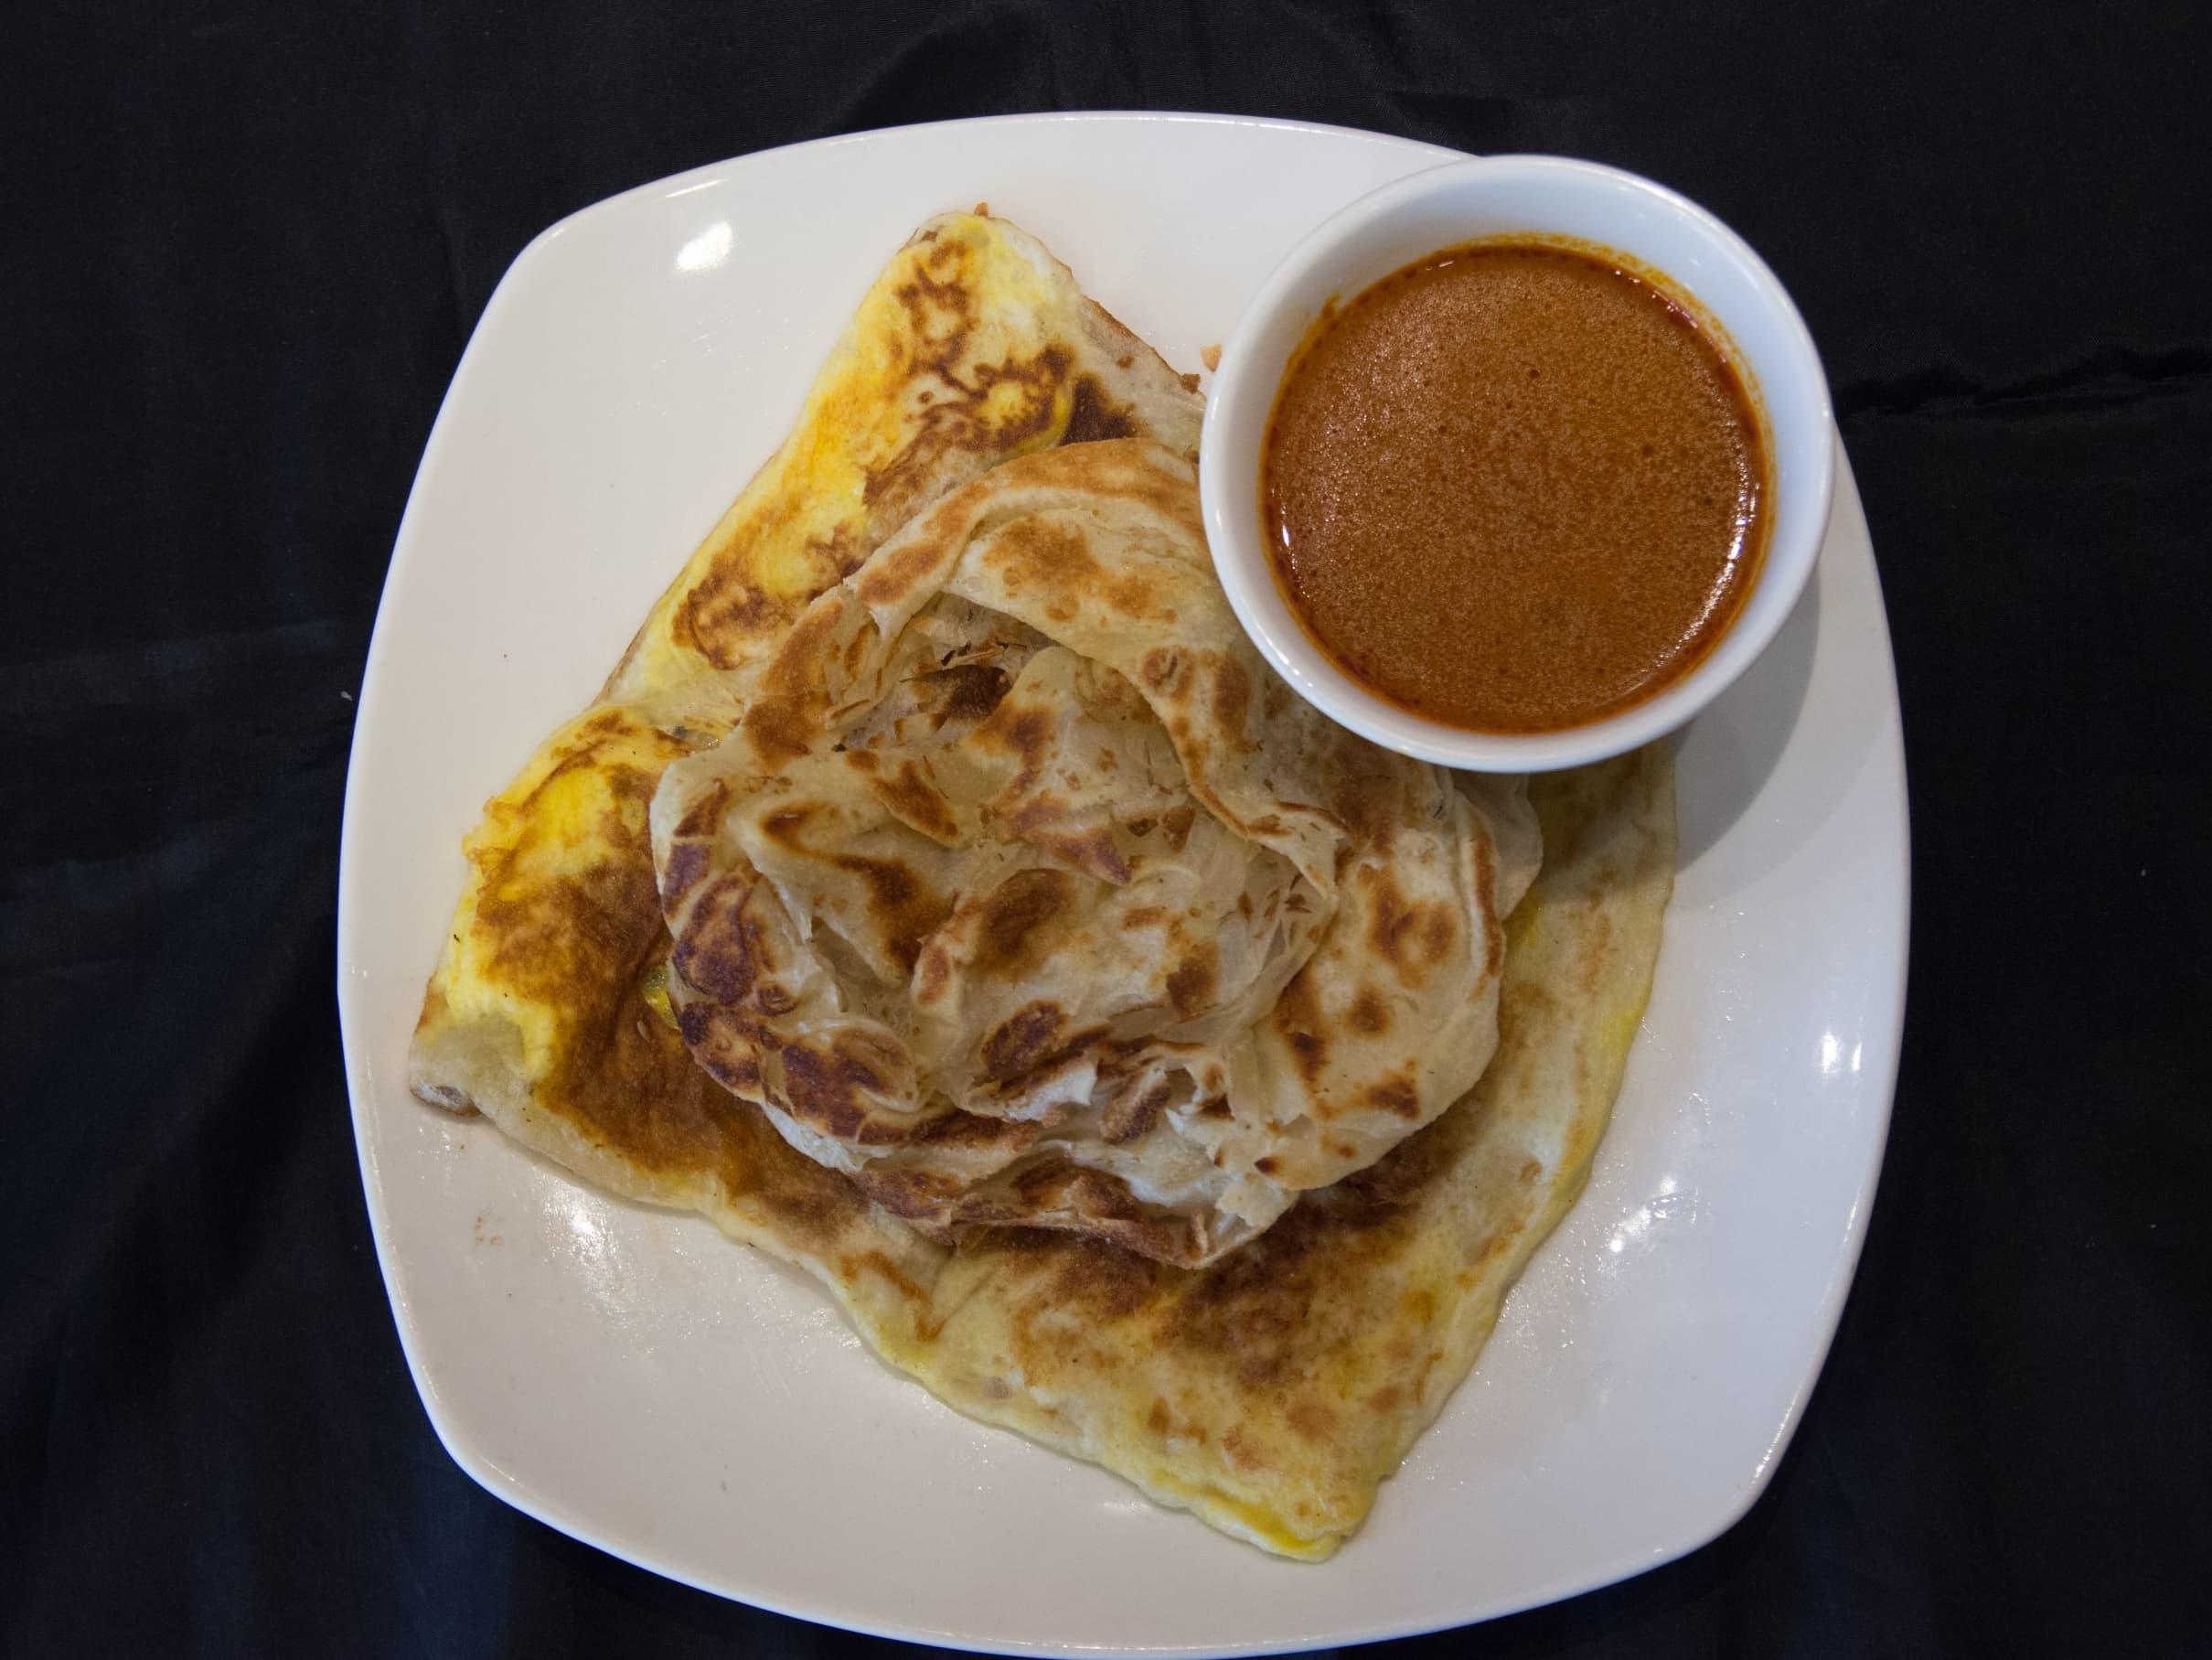 1 x Plain Prata + Egg Prata + Hot Drink